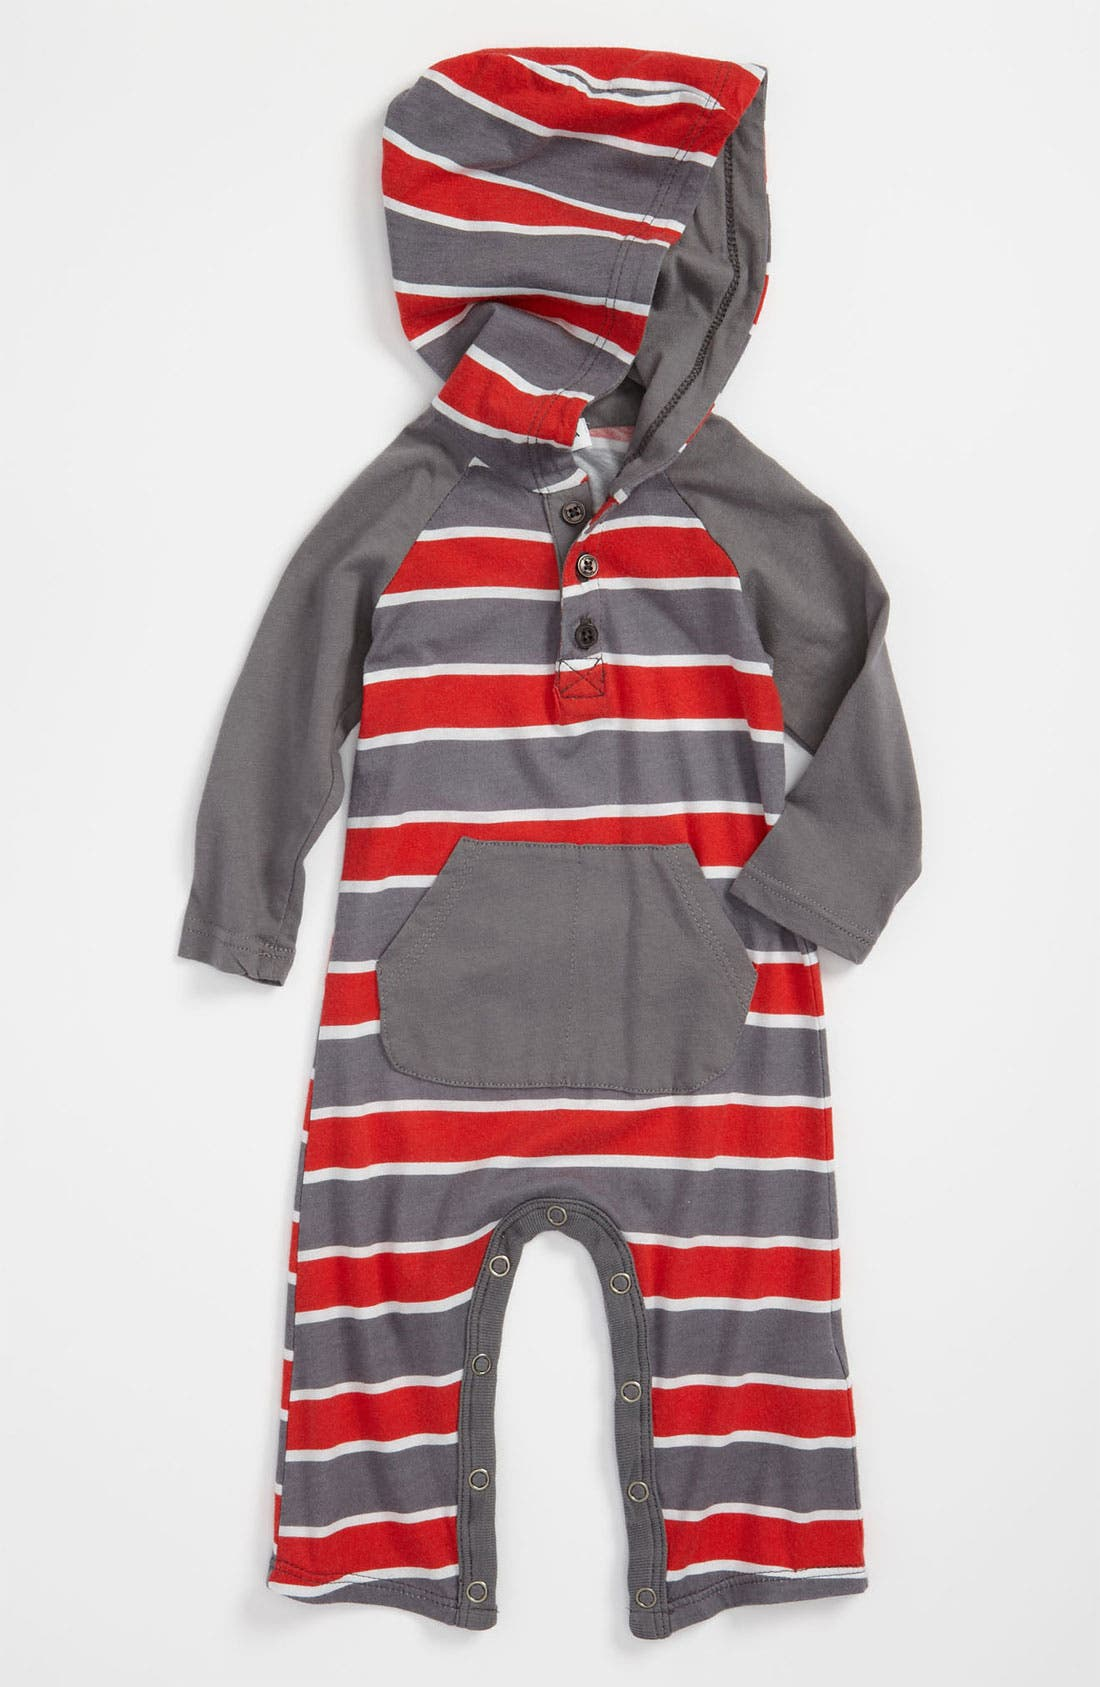 Main Image - Splendid 'Chesapeake Rugby' Hooded Romper (Infant)